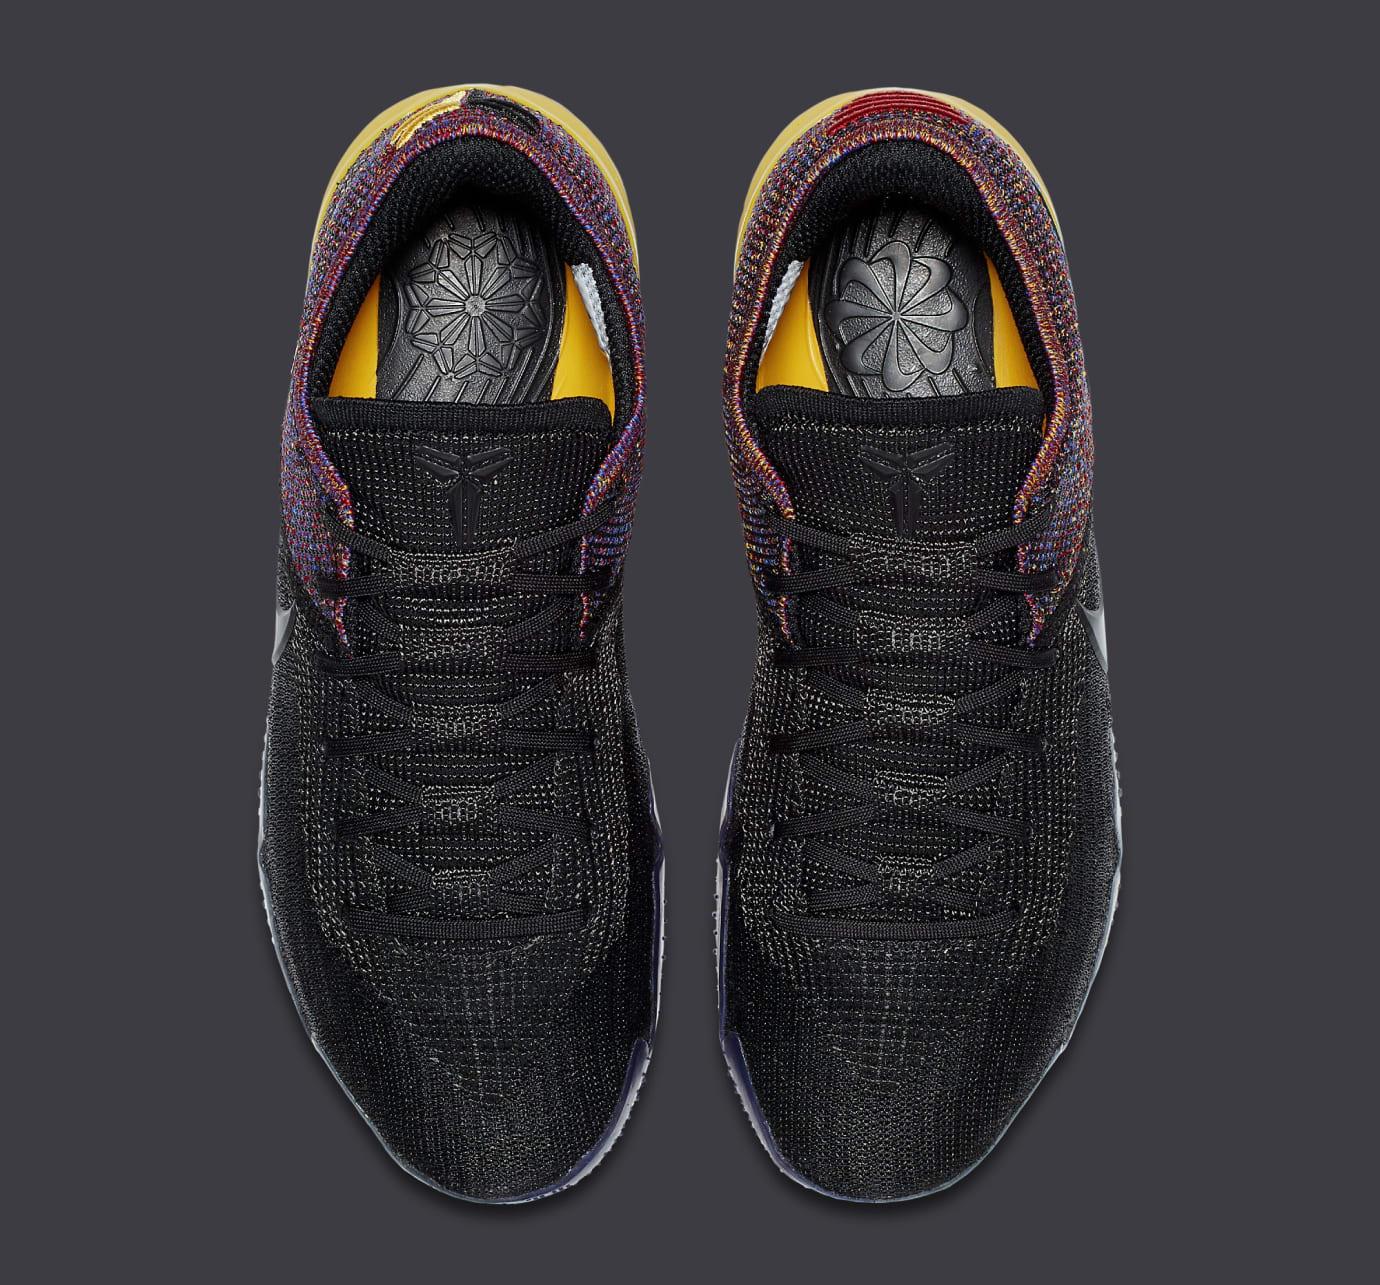 57289e07b9a Image via Nike Nike Kobe A.D. NXT 360 Black Multicolor Release Date AQ1087- 002 Top